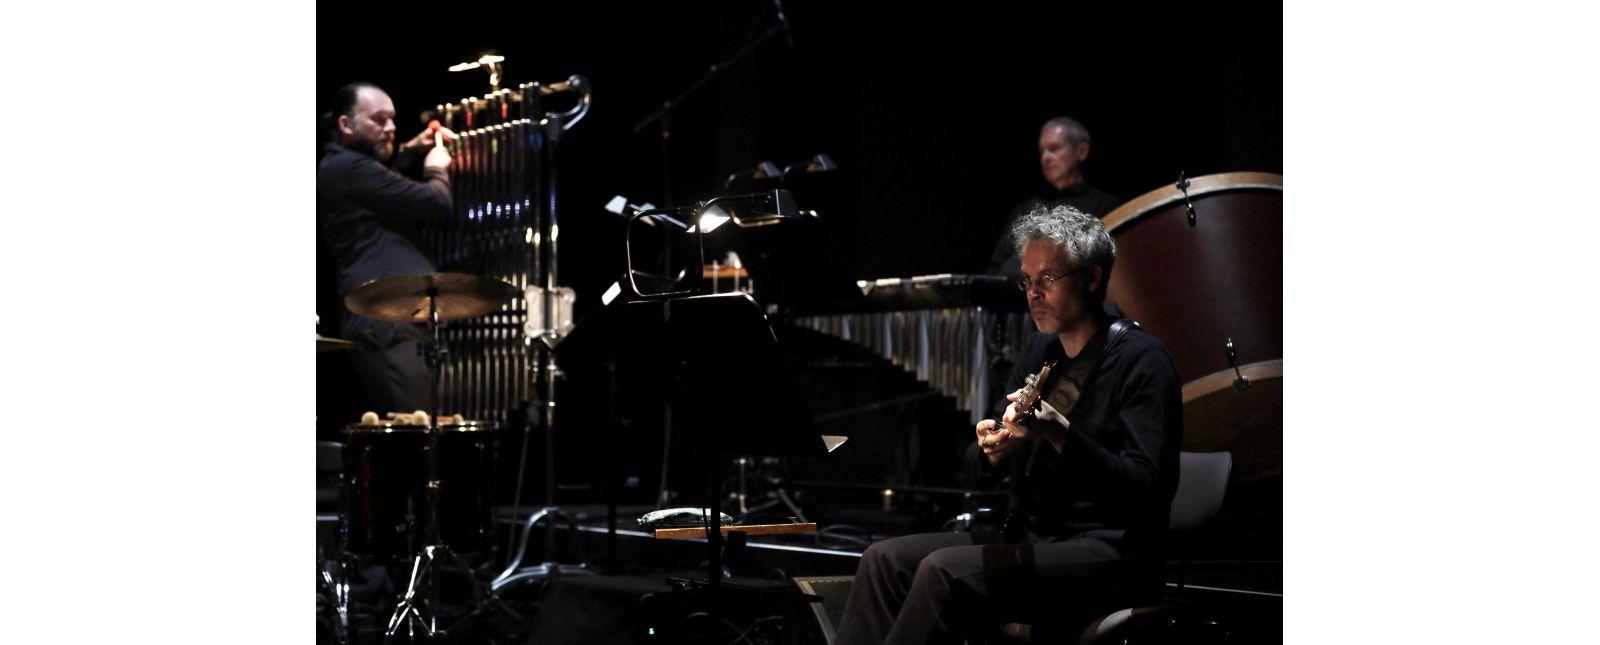 SCHAUINSLAND - The Misfortune of the English // John Eckhardt / Philharmonisches Orchester Freiburg // Foto: Paul Leclaire